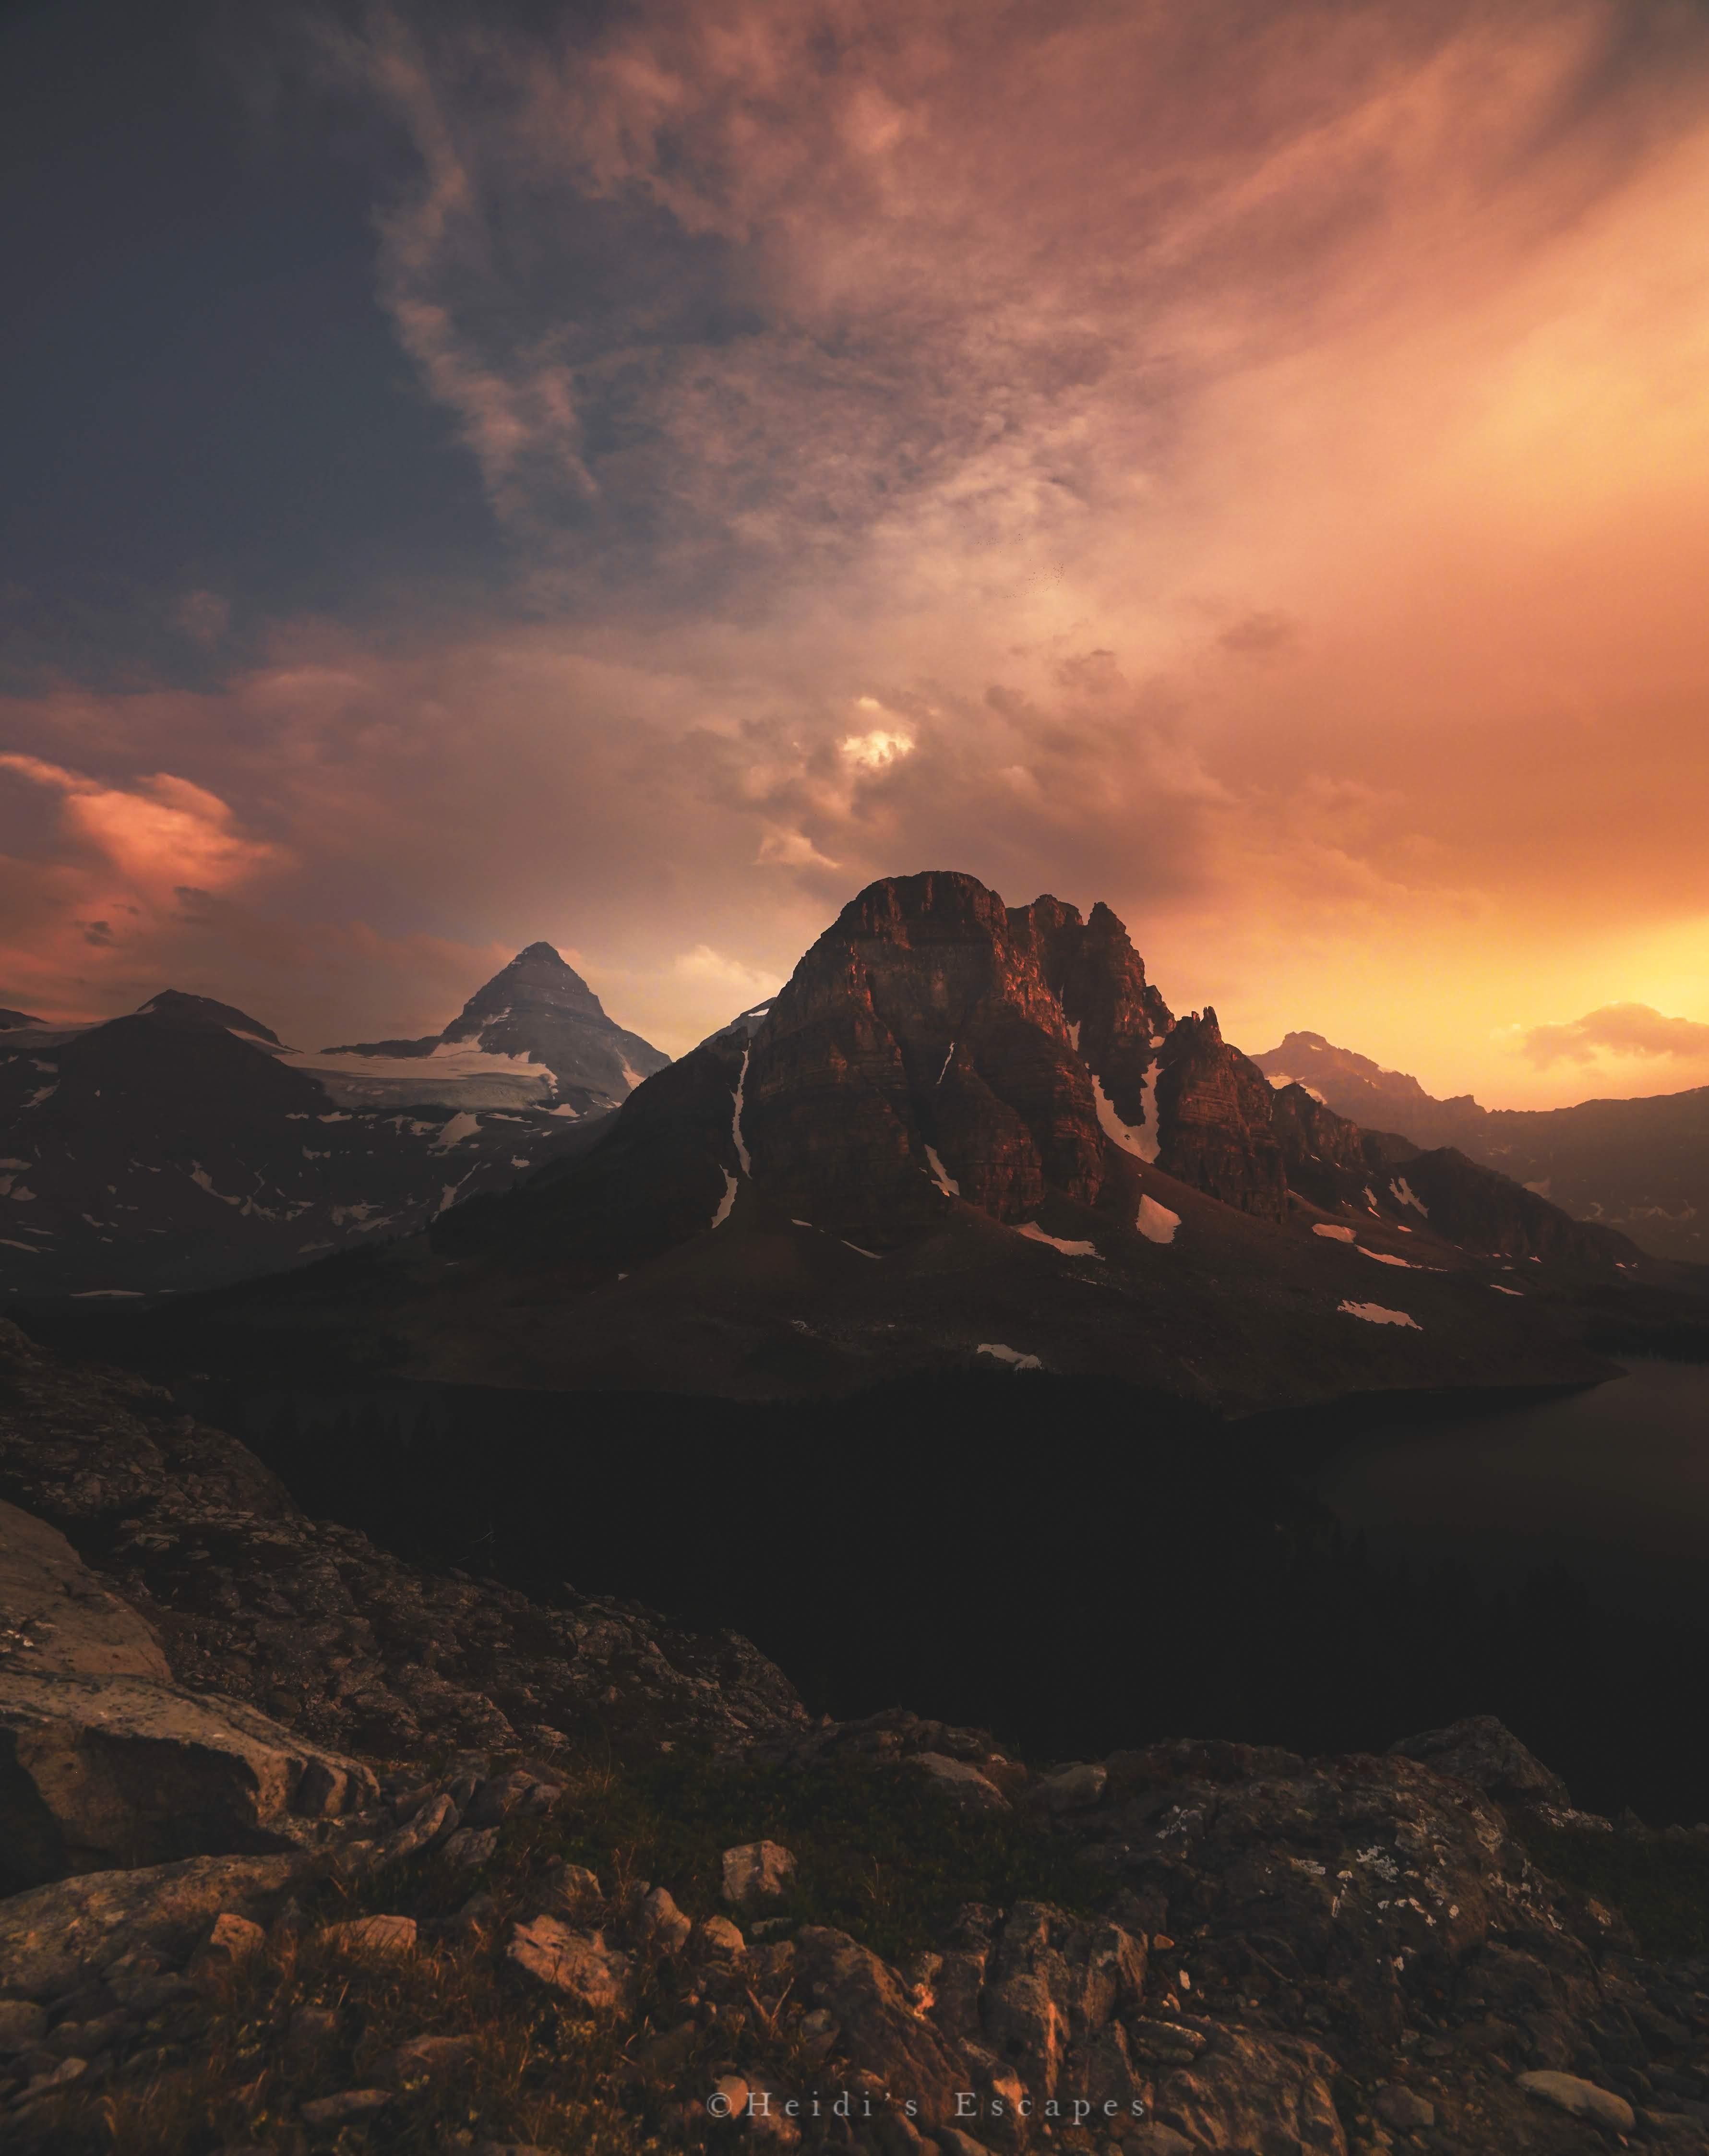 Mount Assiniboine National Park